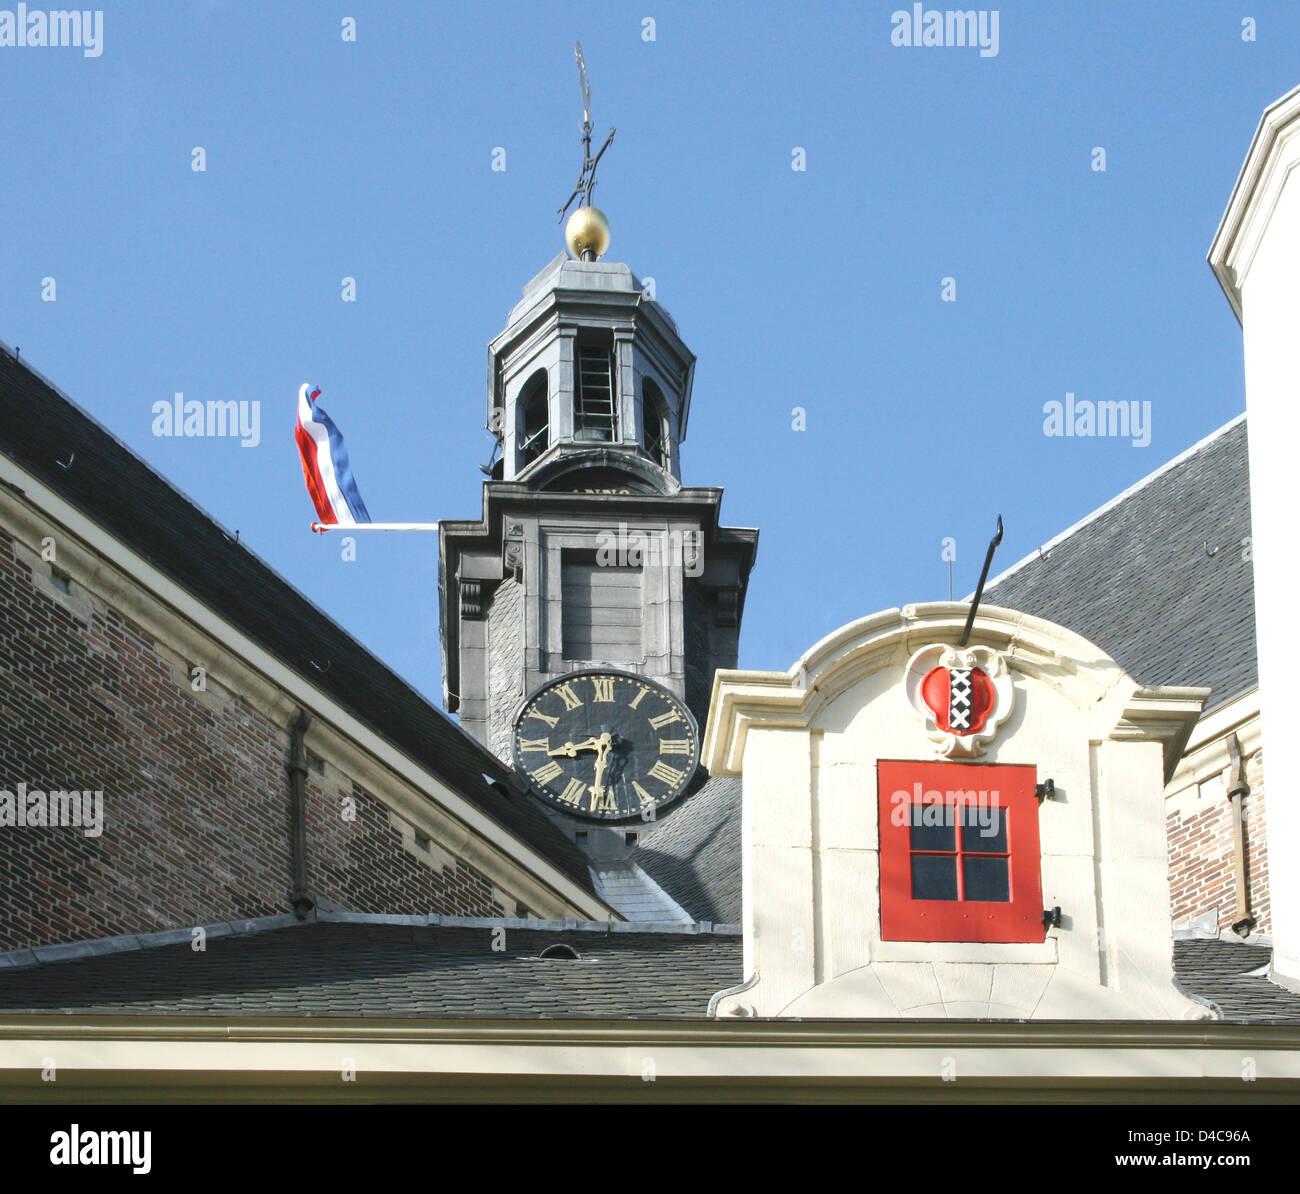 The Netherlands Holland Amsterdam Noorderkerk Church 1623 Architect Hendrick de Keyser Prinsengracht Noordermarkt - Stock Image